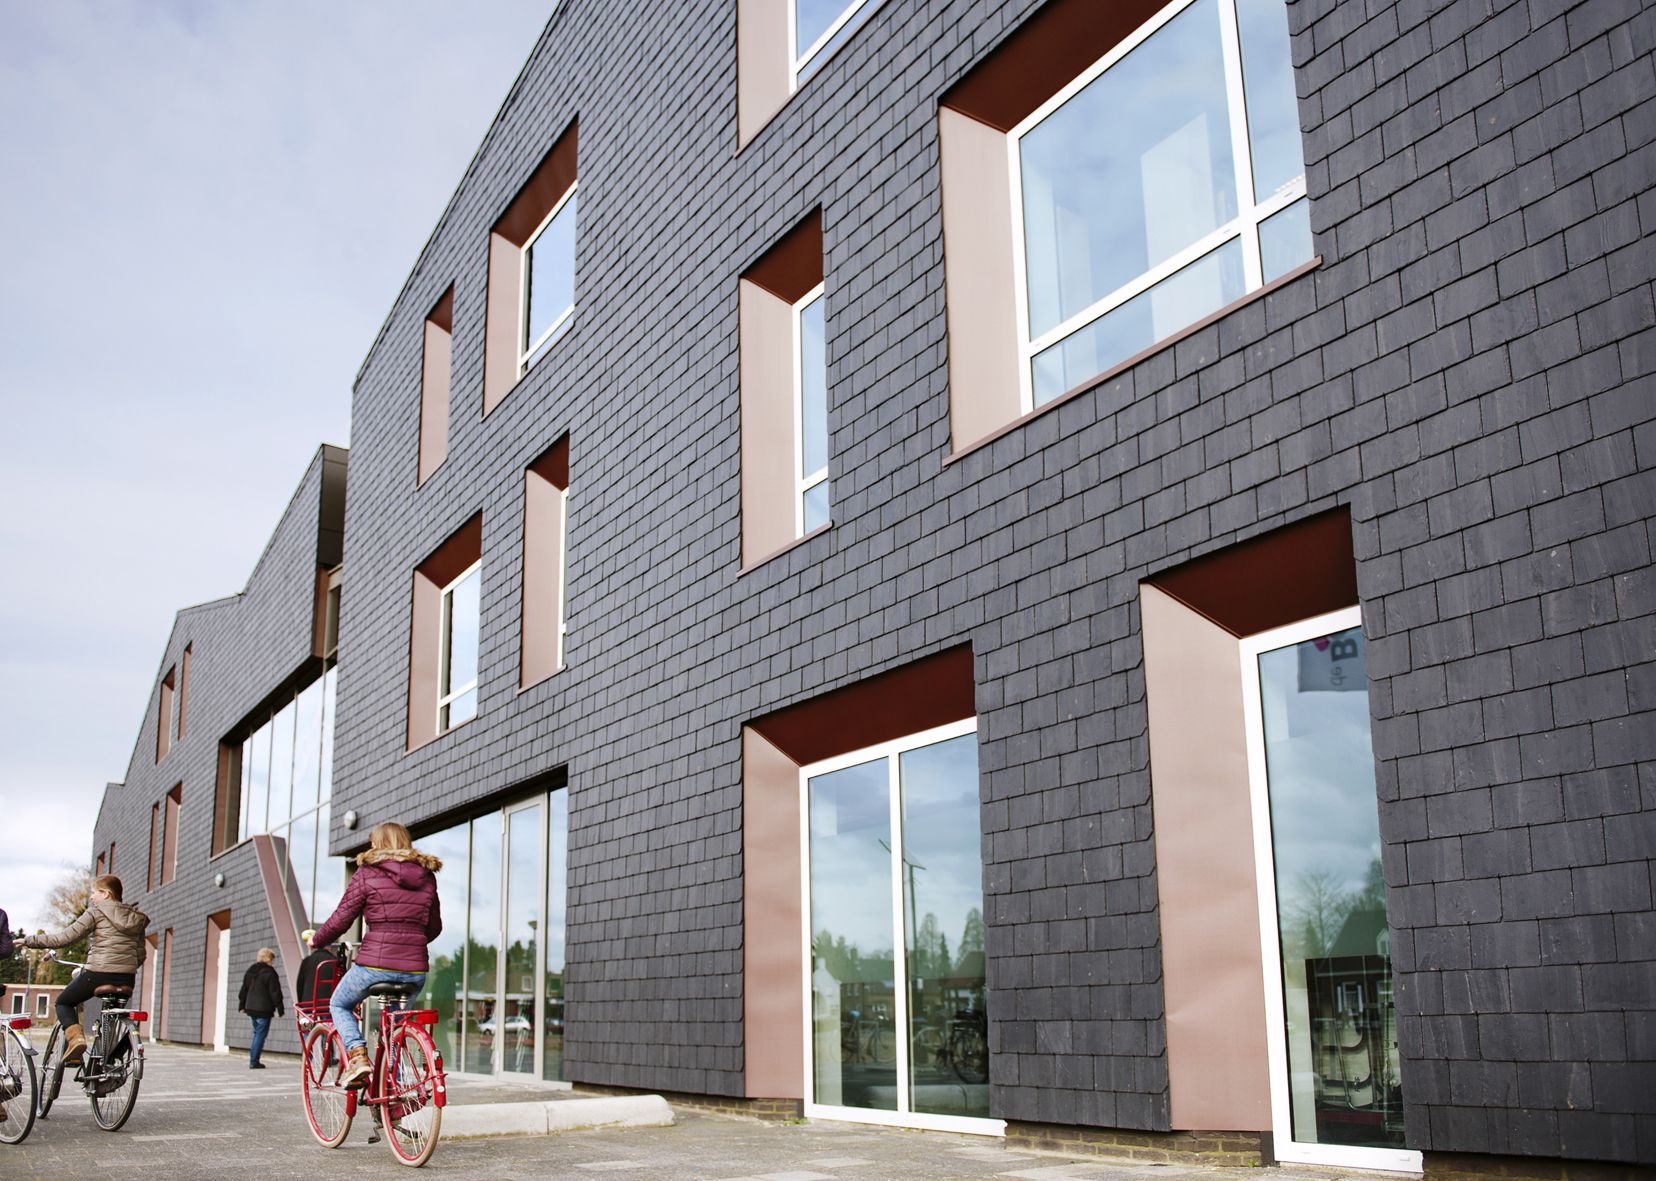 Dorpscentrum De Berchplaets Te Berghem Fotografie Madeleine Sars Architectuur Architecten